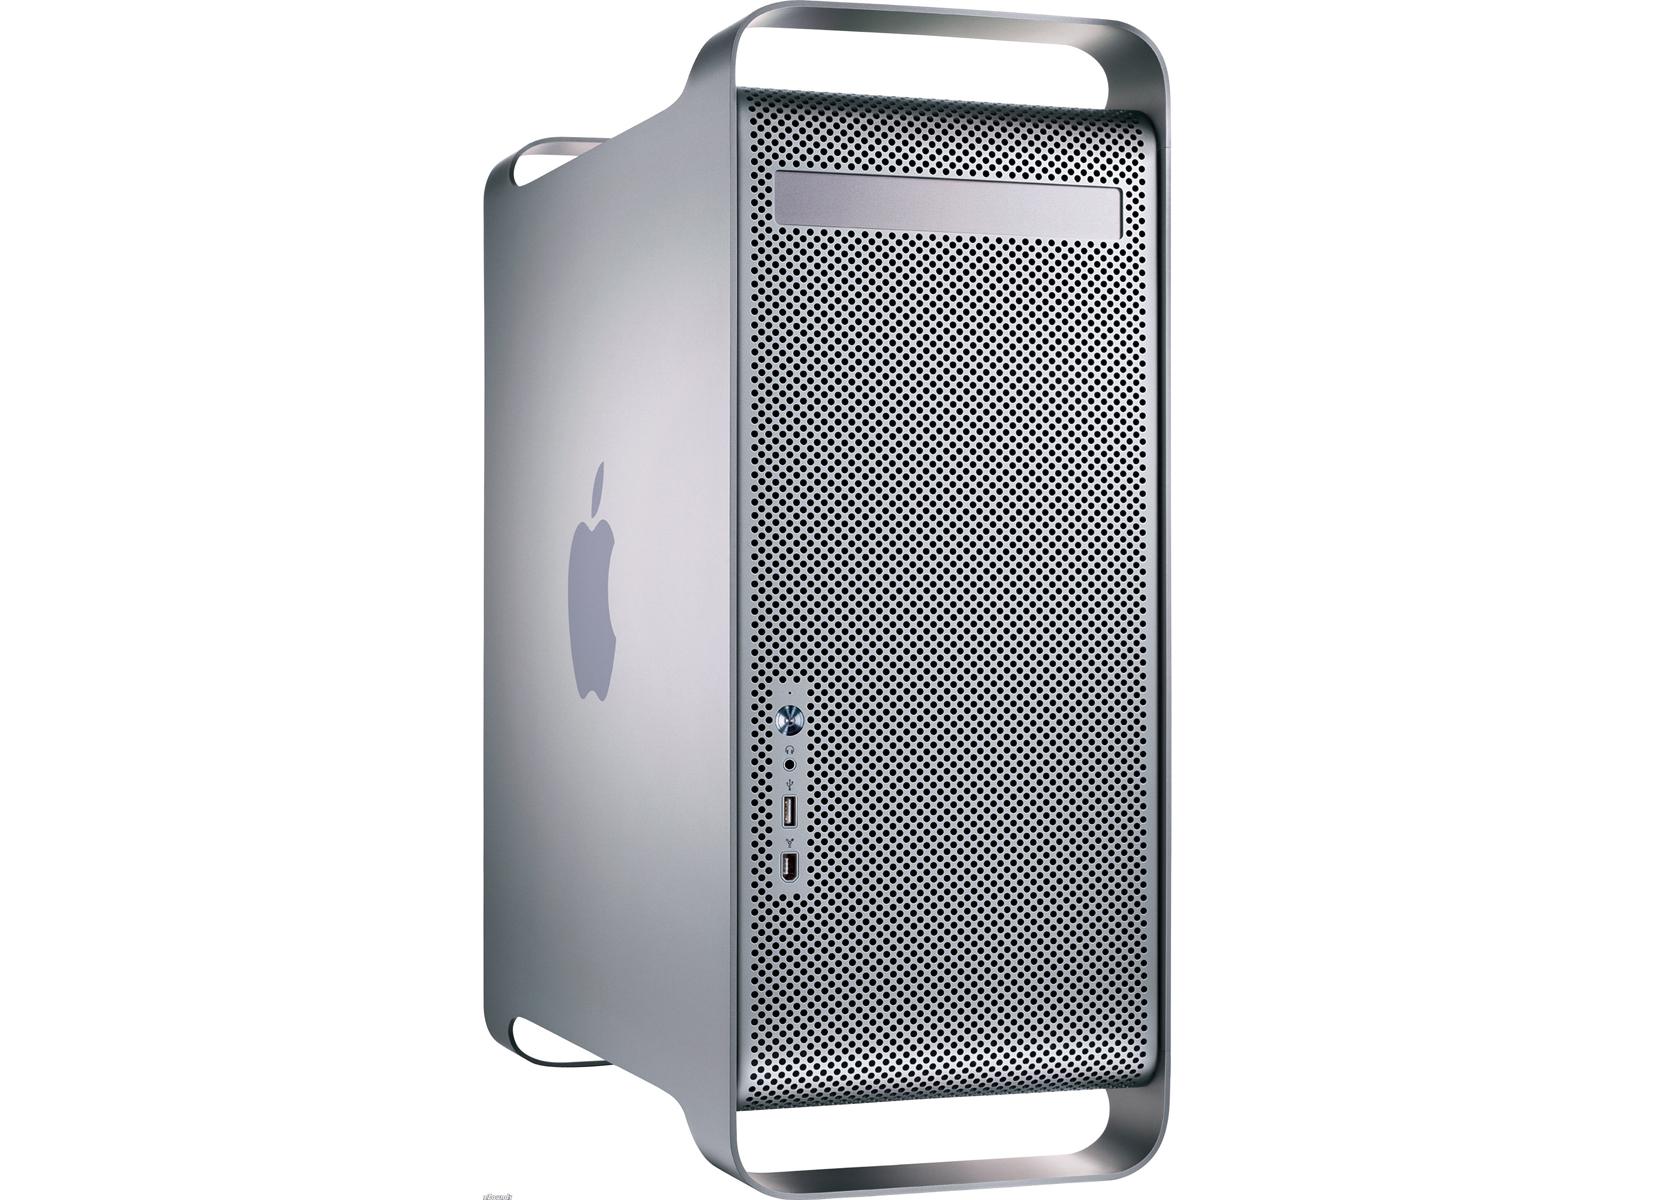 apple power mac g5 desktop reviews